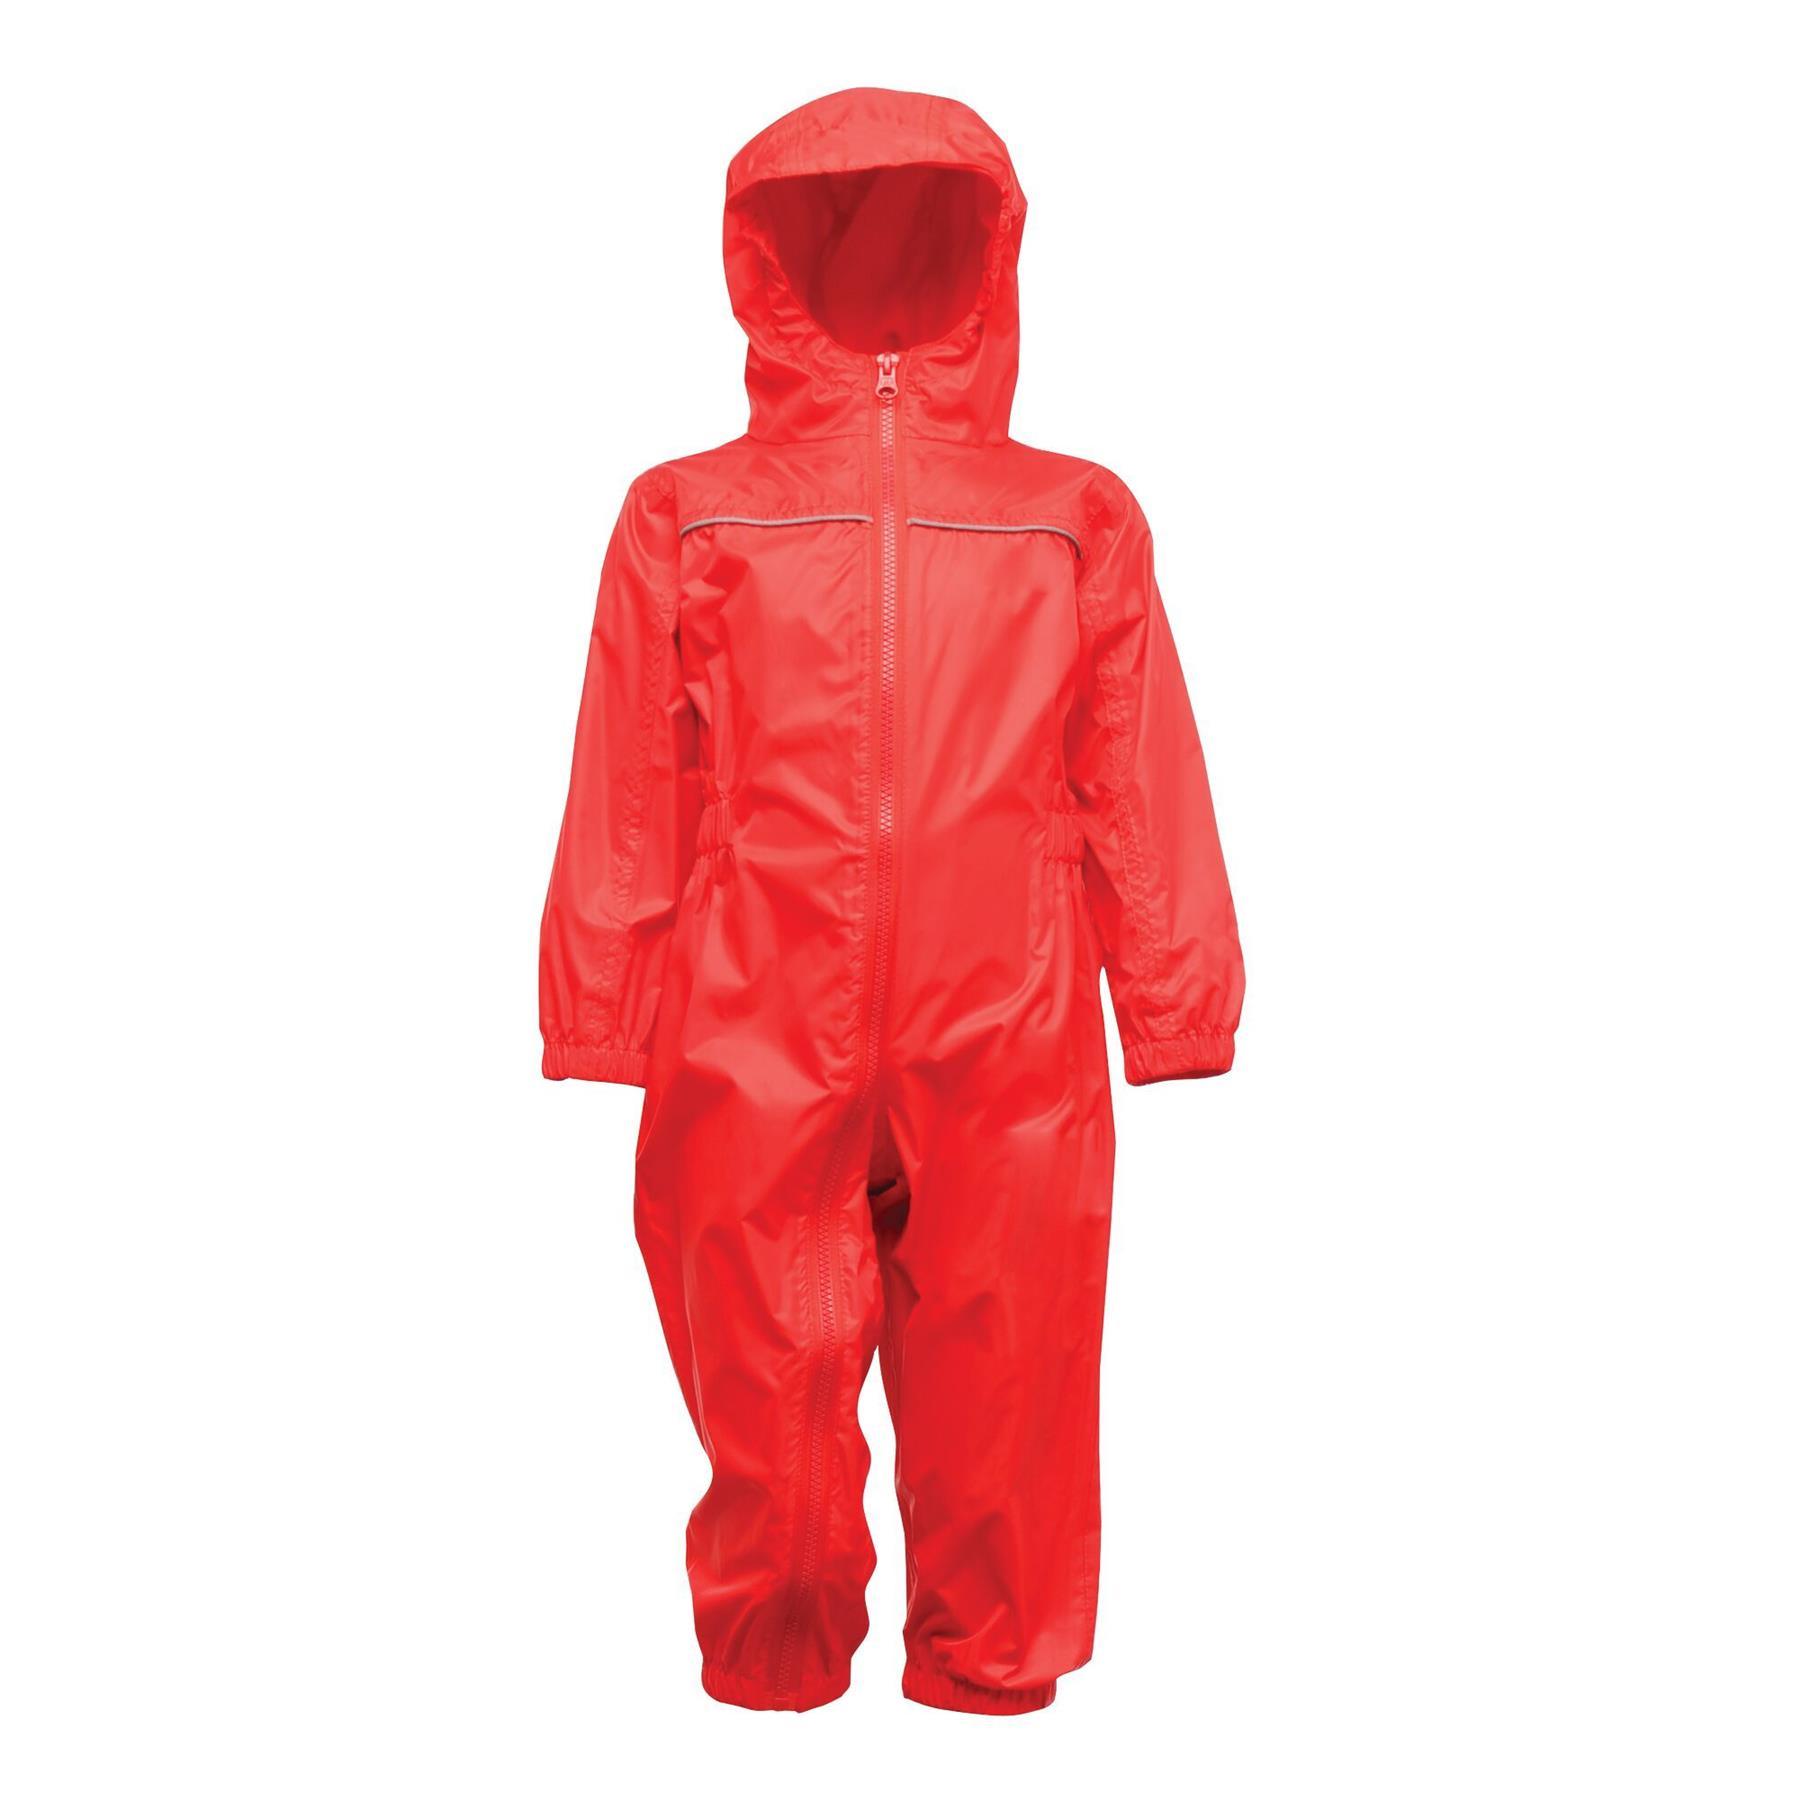 miniatuur 6 - Regatta Kids Rain Suit Puddle Paddle Boys Girls All in One Splash Waterproof